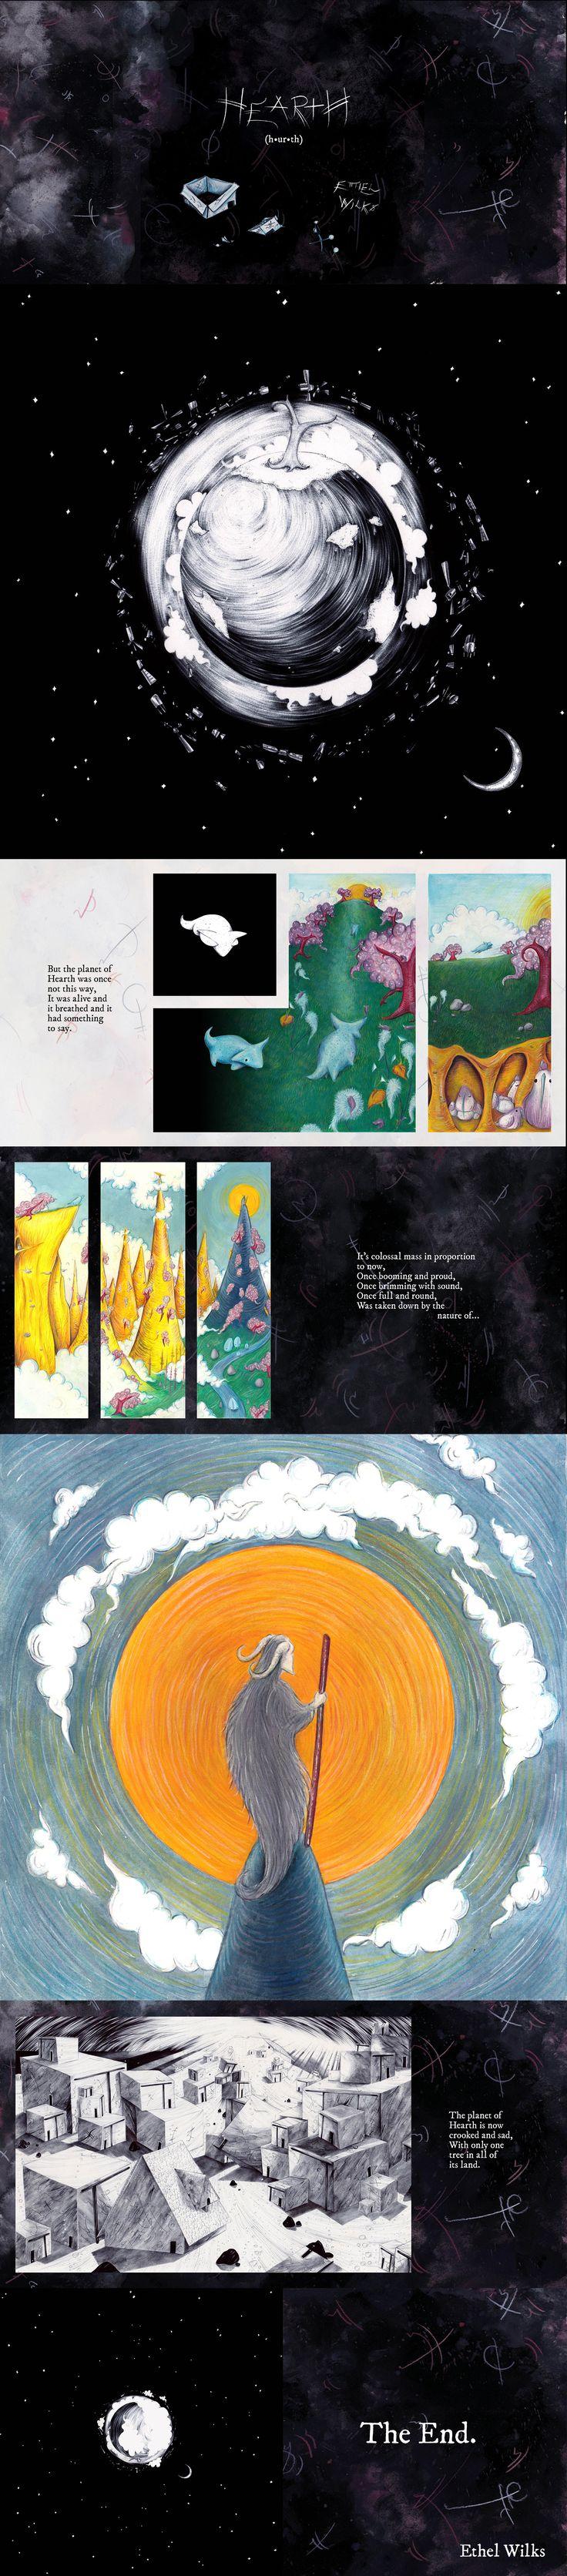 'Hearth (h•ur•th)' by Ethel Wilks  #illustration #picturebook #graphicnovel #art #drseuss #shauntan #shauntan #gouache #biro #childrensbook